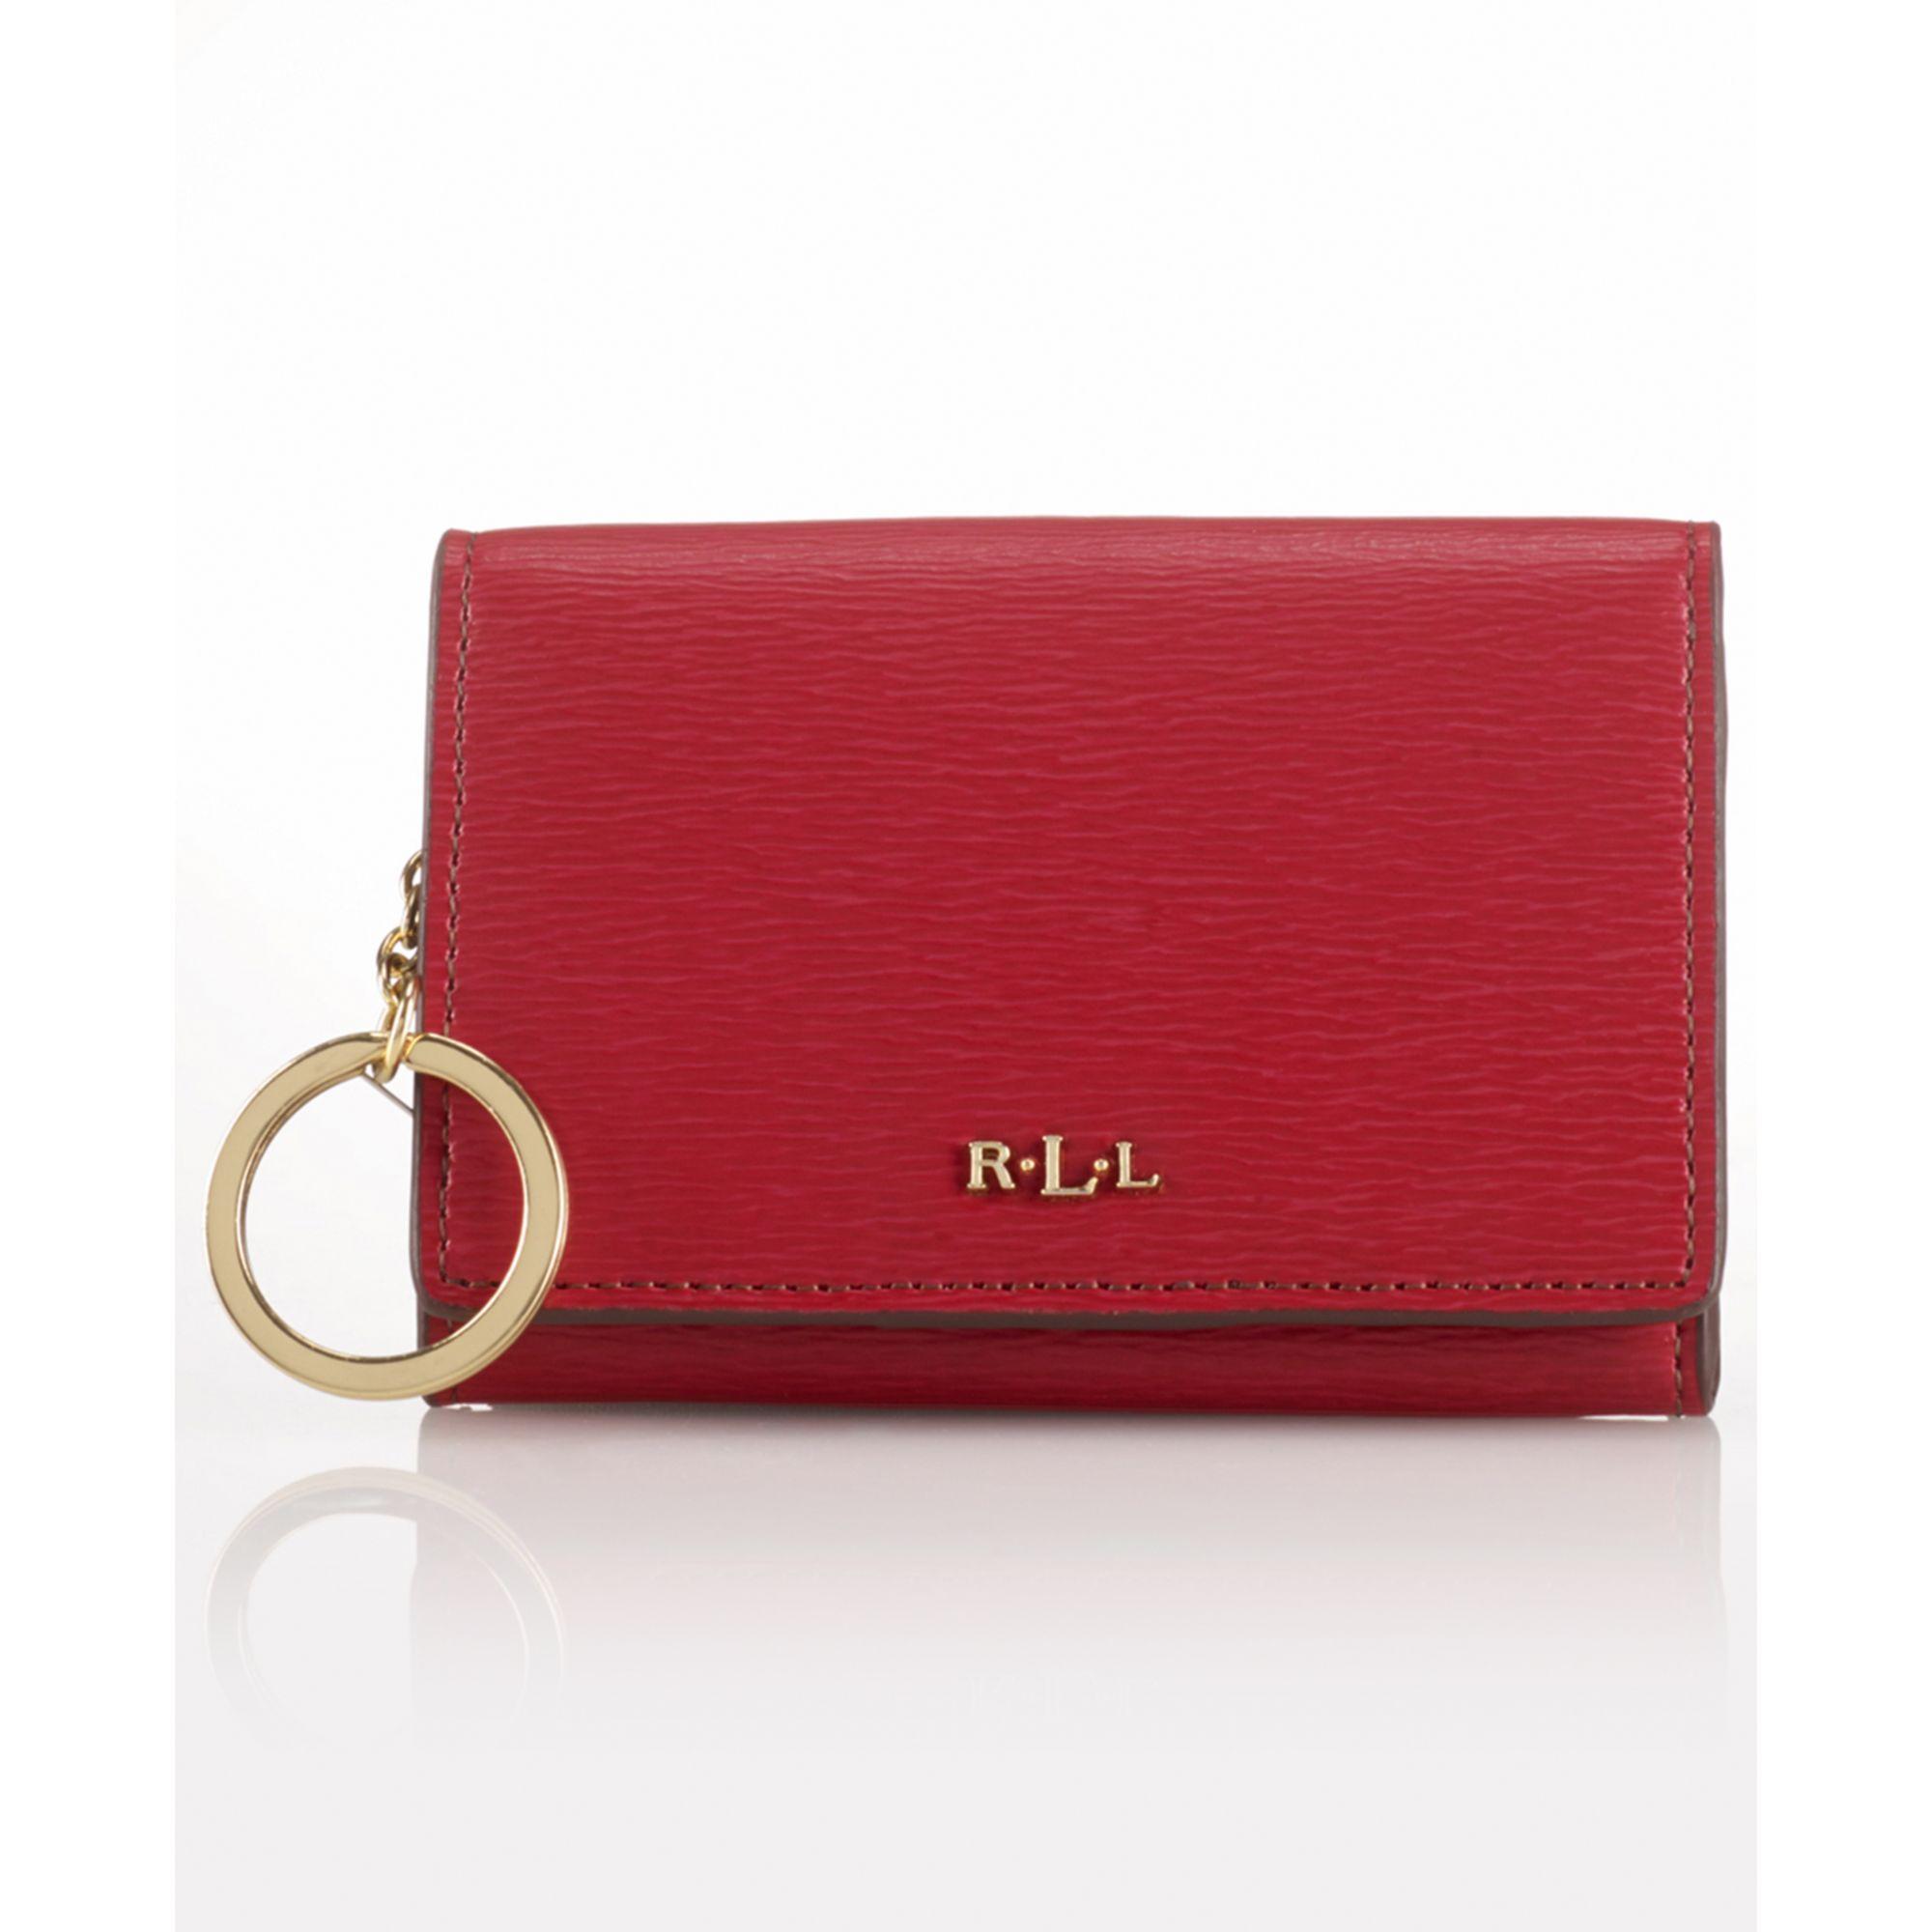 ac5b66458d0 Lyst - Lauren by Ralph Lauren Tate Coin Purse in Red